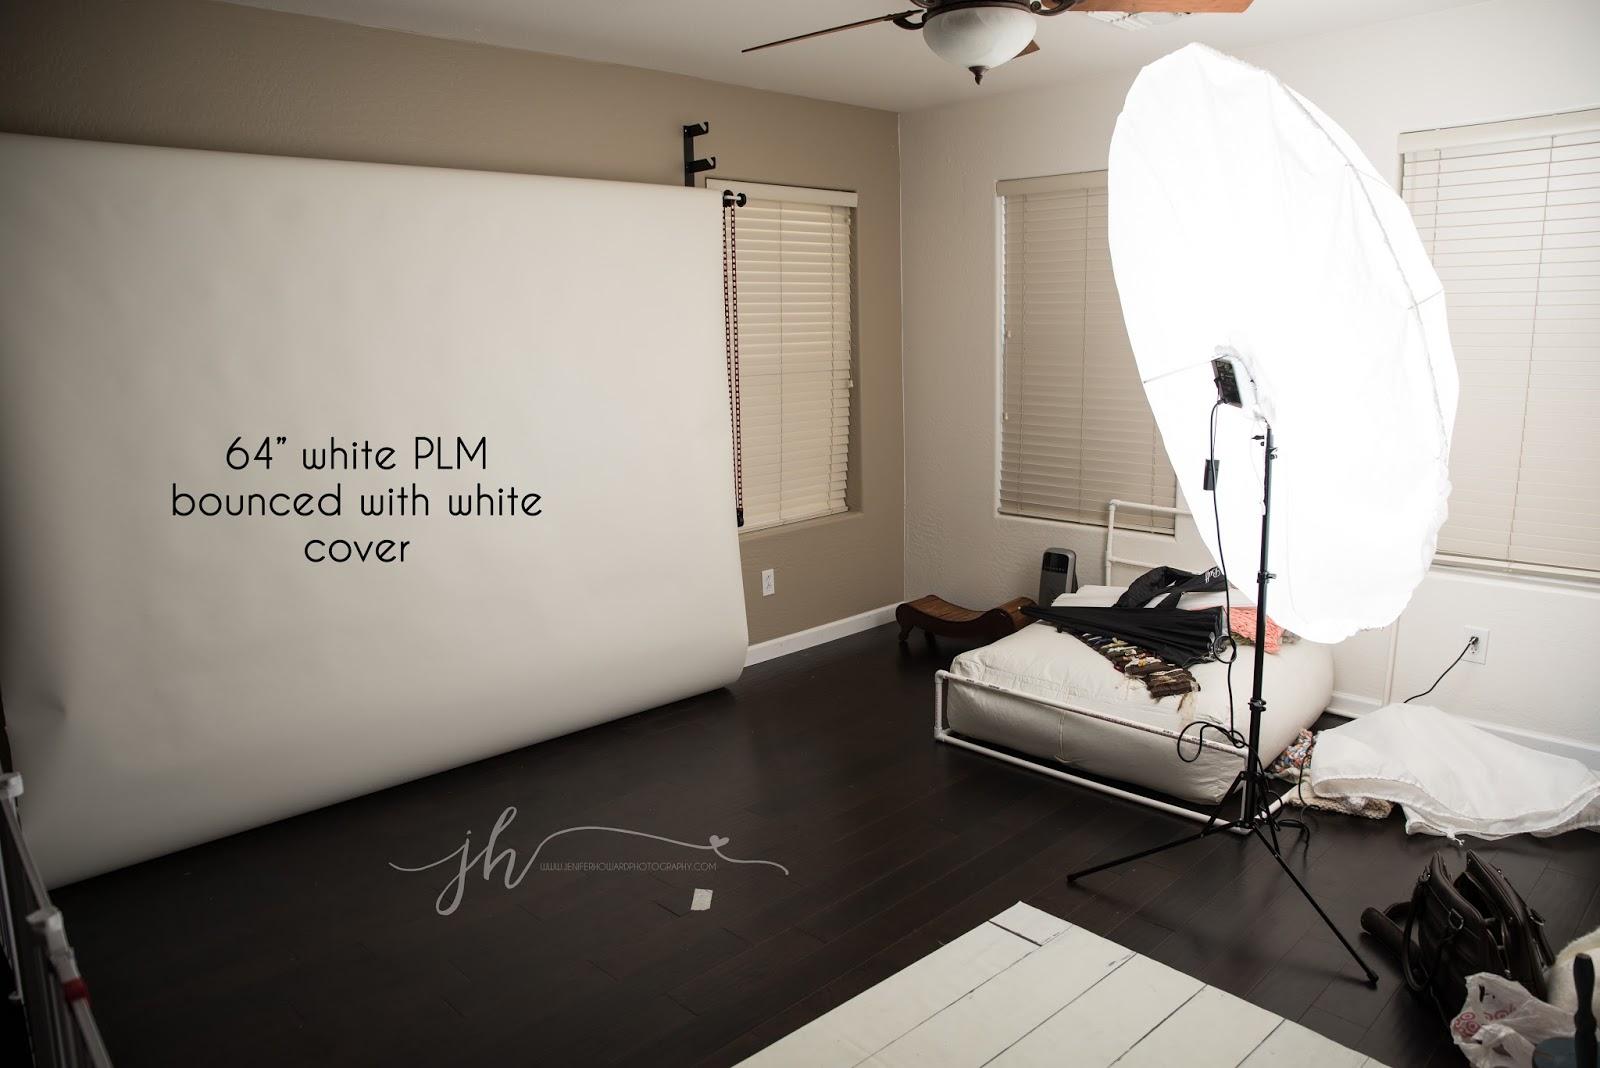 Greensboro newborn photographer studio lighting which plm system